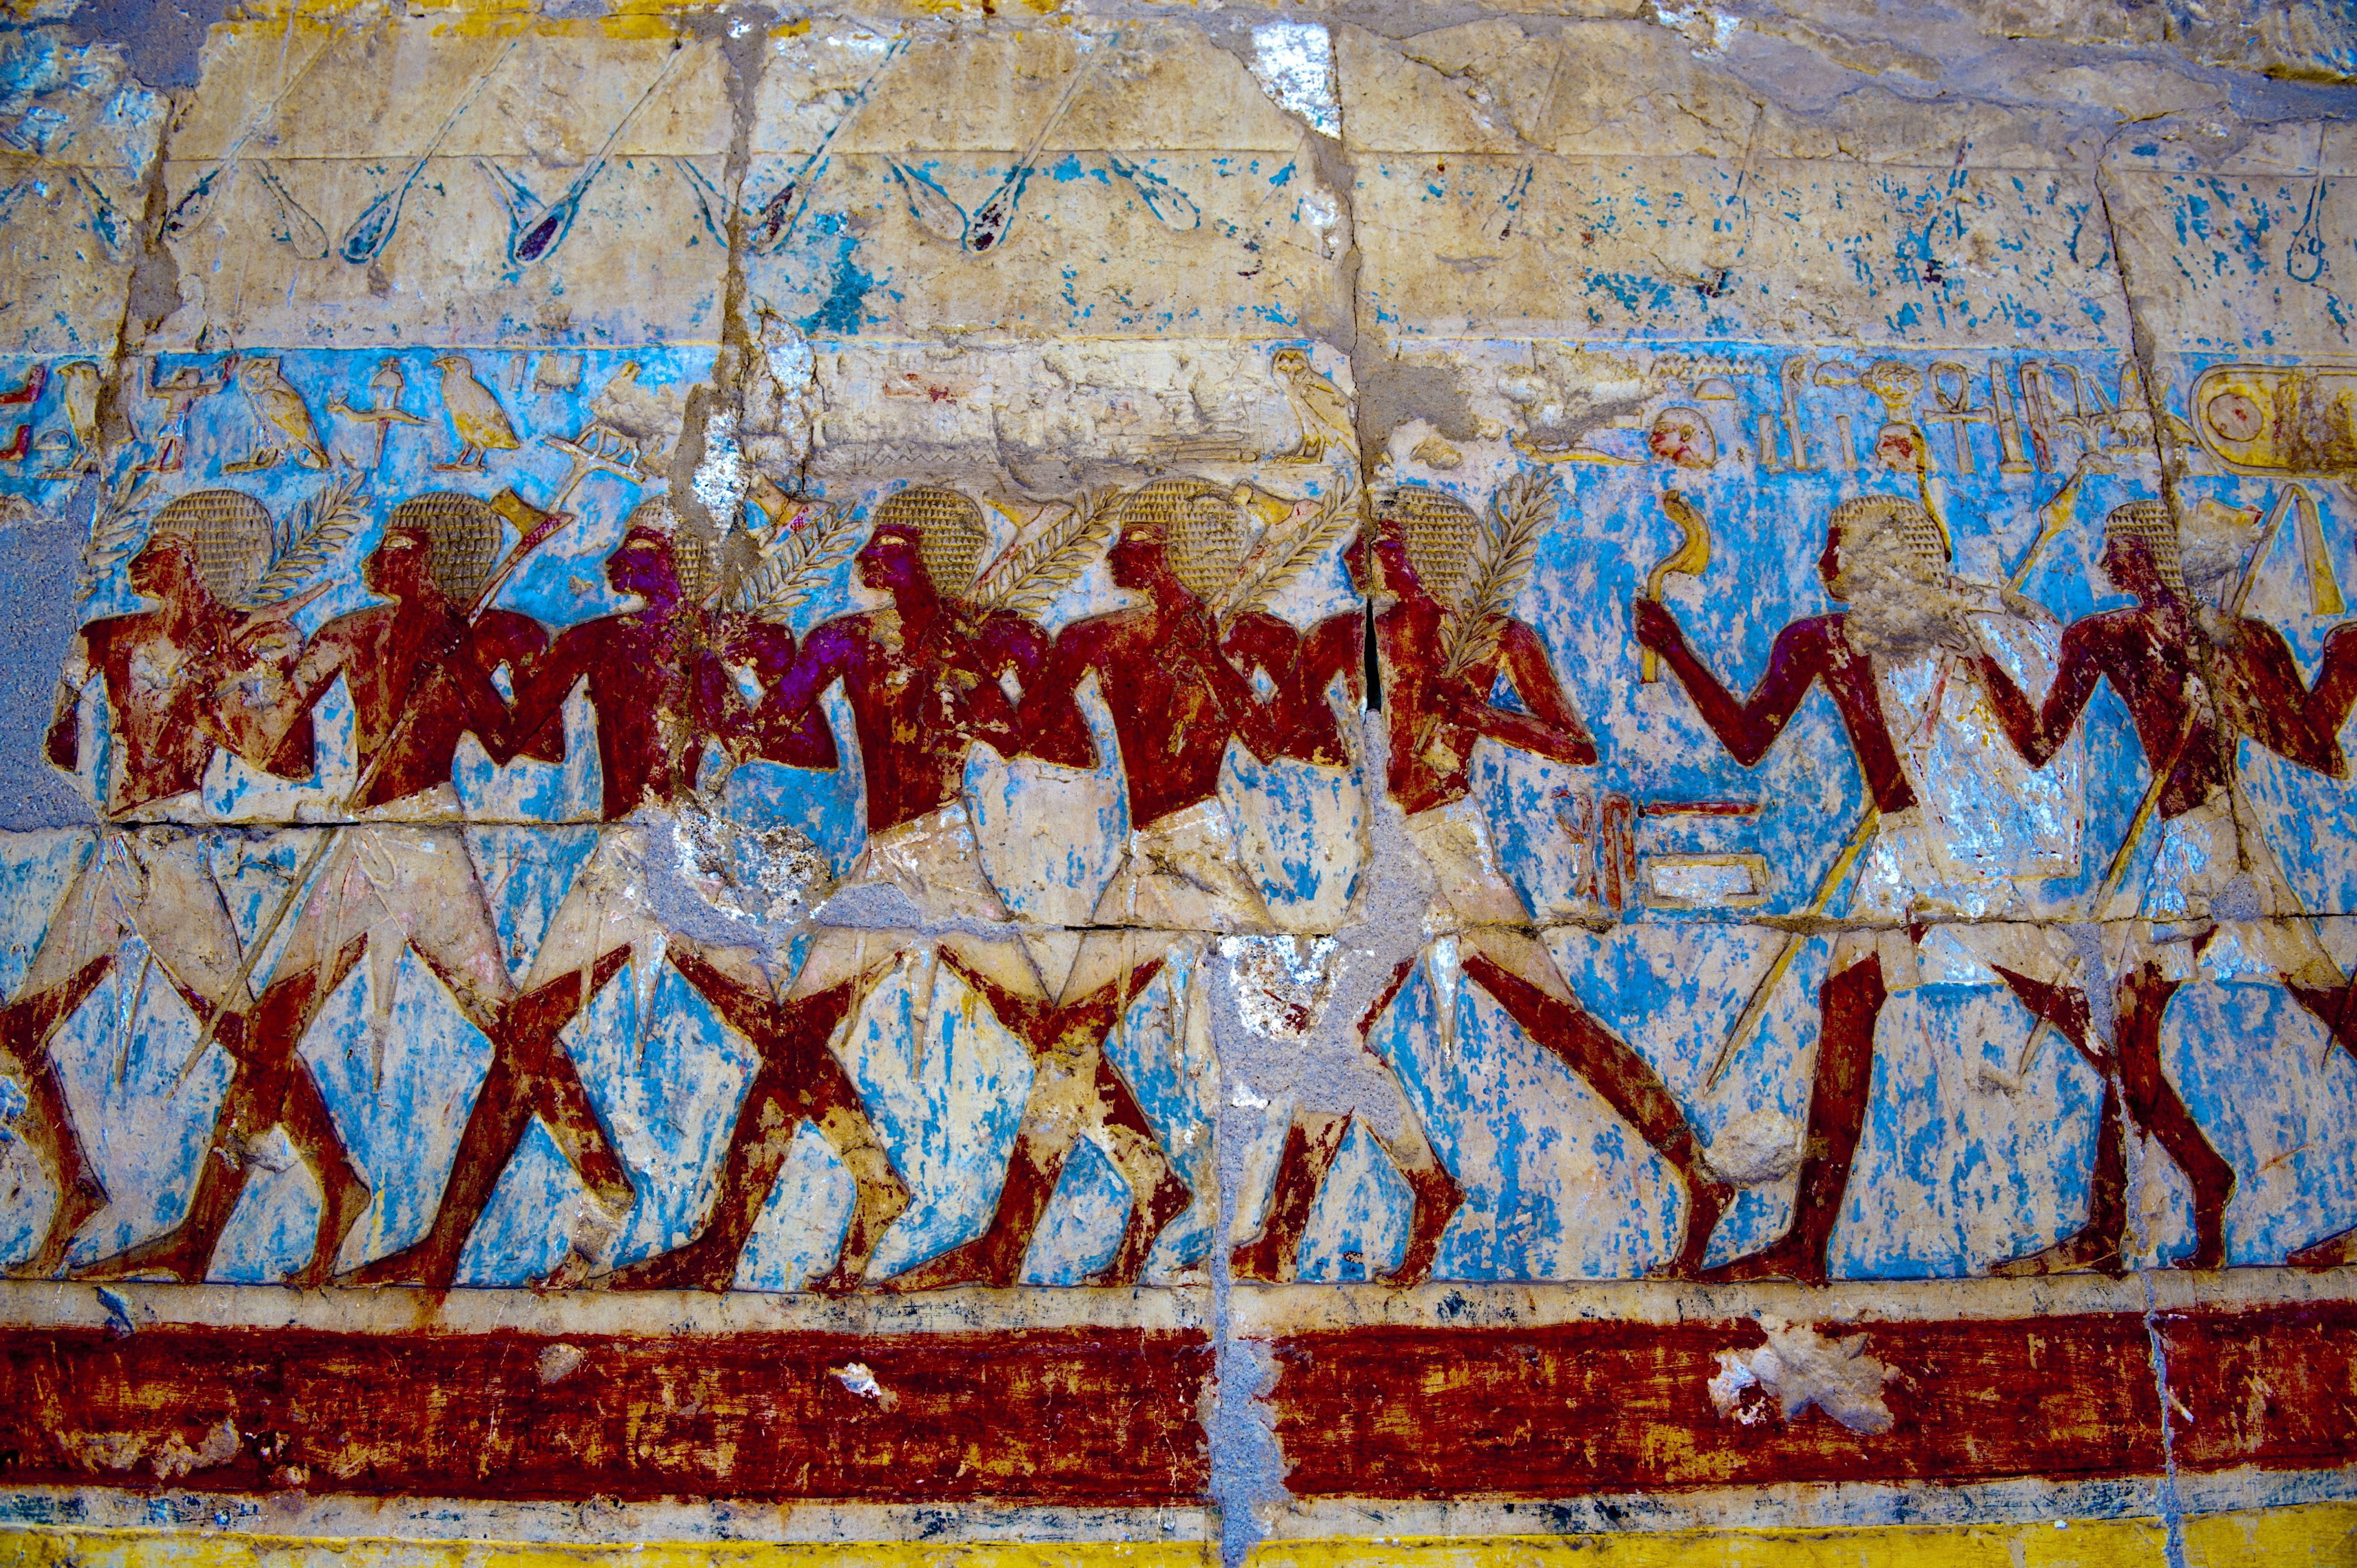 Hatshepsut Temple Jpg 5200 3460 Ancient Egypt History Ancient Egypt Pictures Ancient Egypt